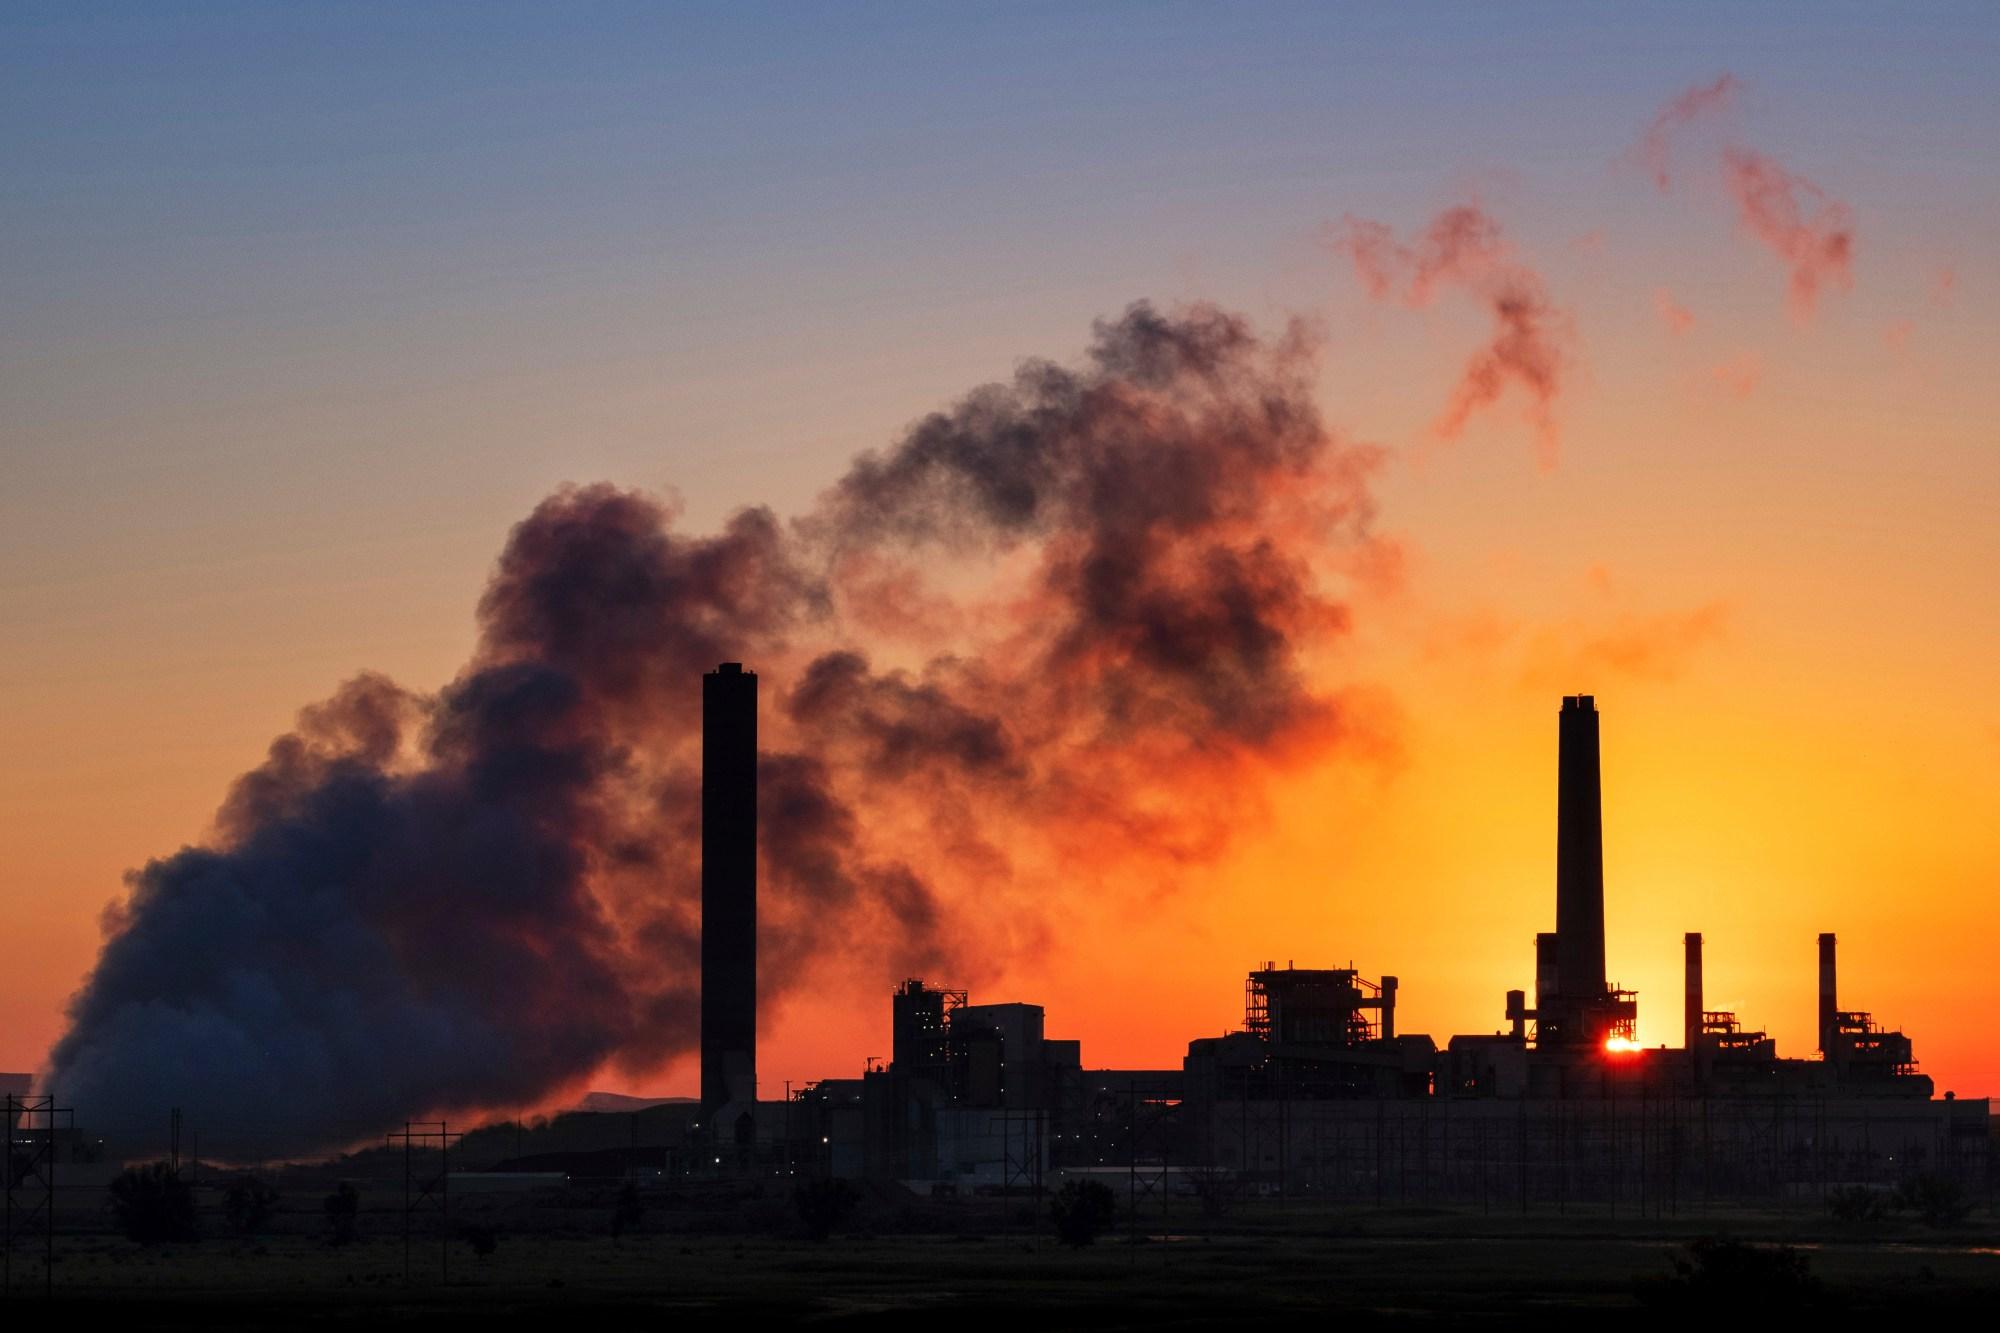 EPA_Coal_29687-159532.jpg30173642